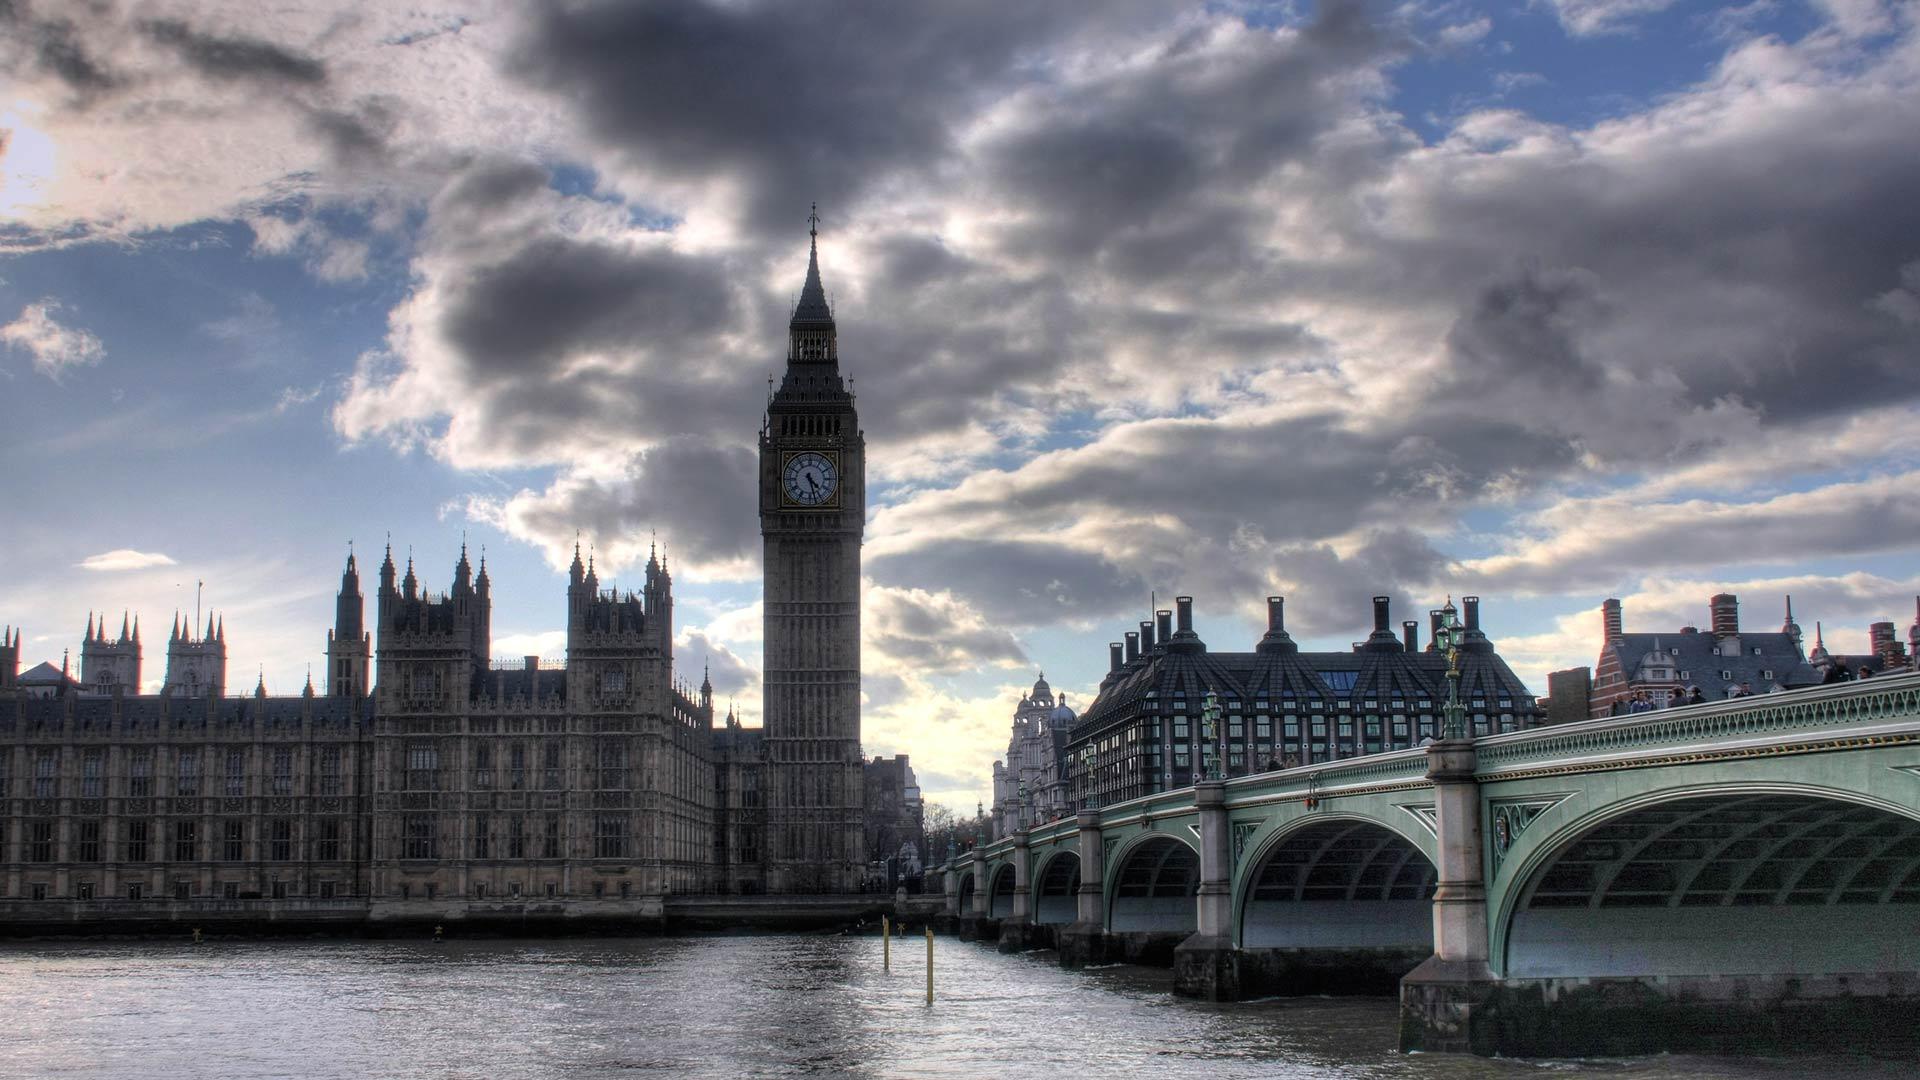 Hd wallpaper london -  London Desktop Wallpaper Hd